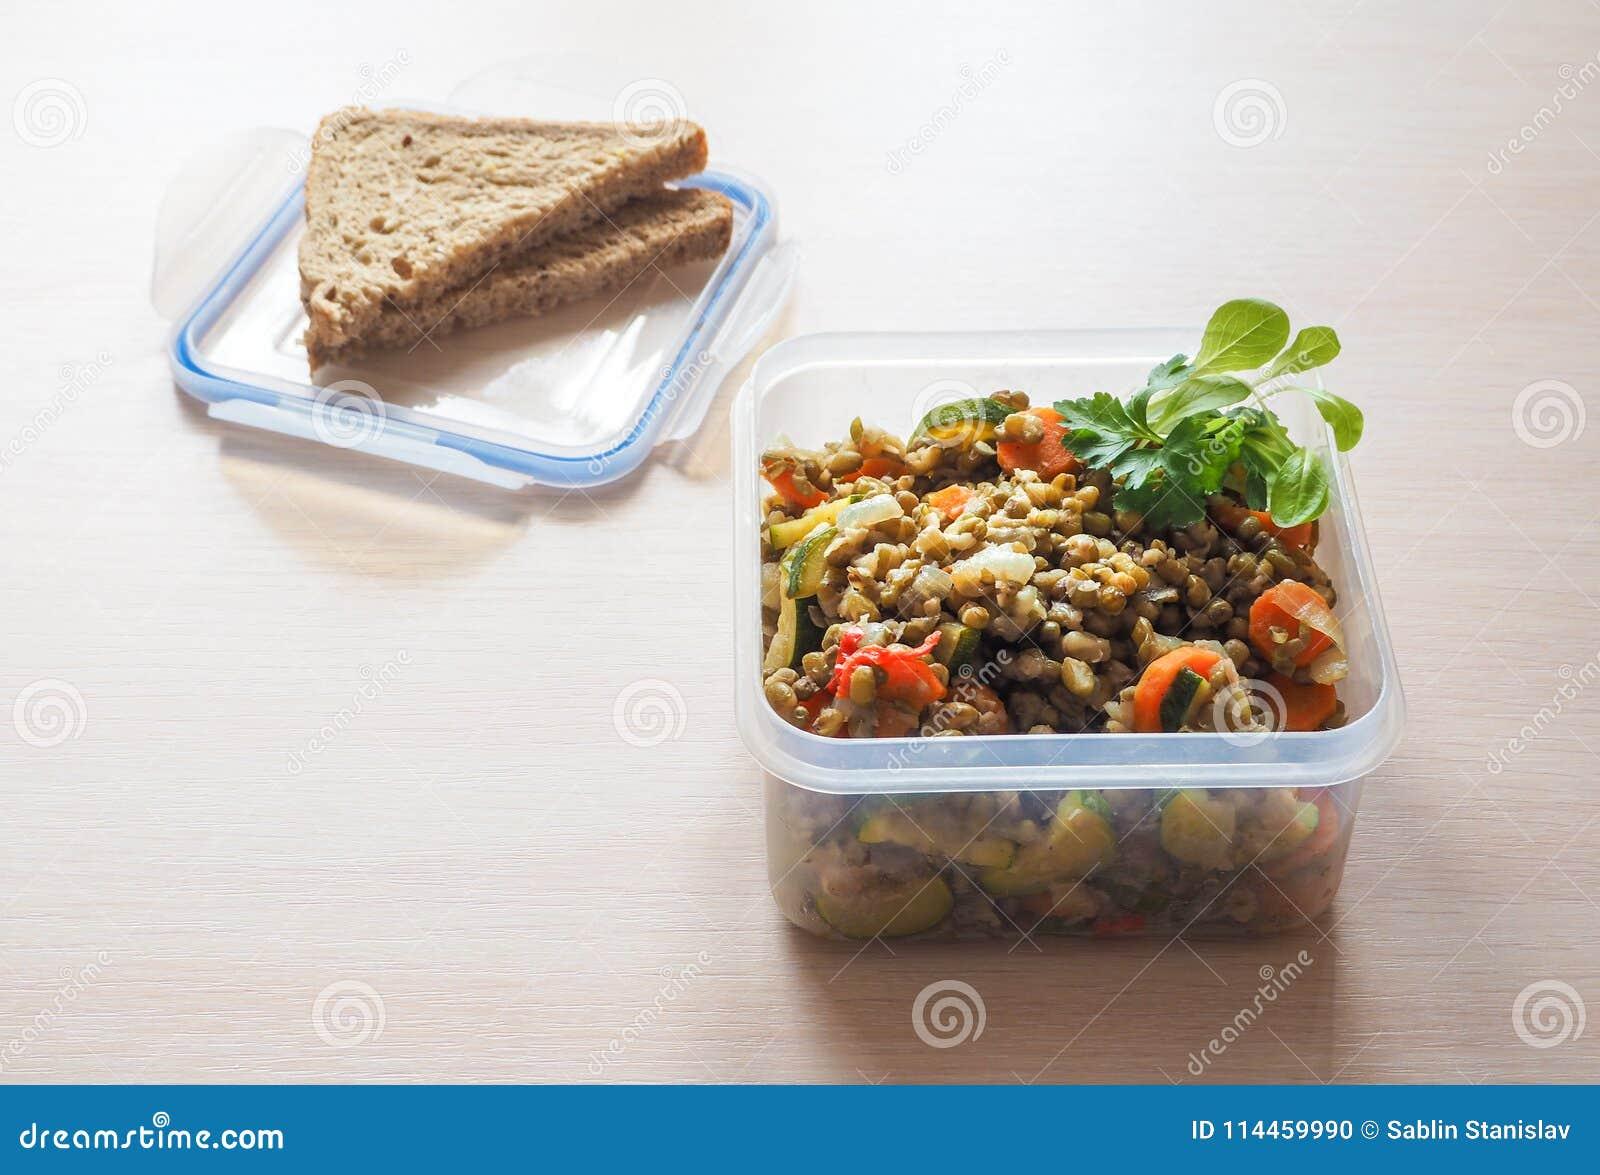 Recipientes de armazenamento plásticos vazios do alimento o conceito do armazenamento a longo prazo dos produtos